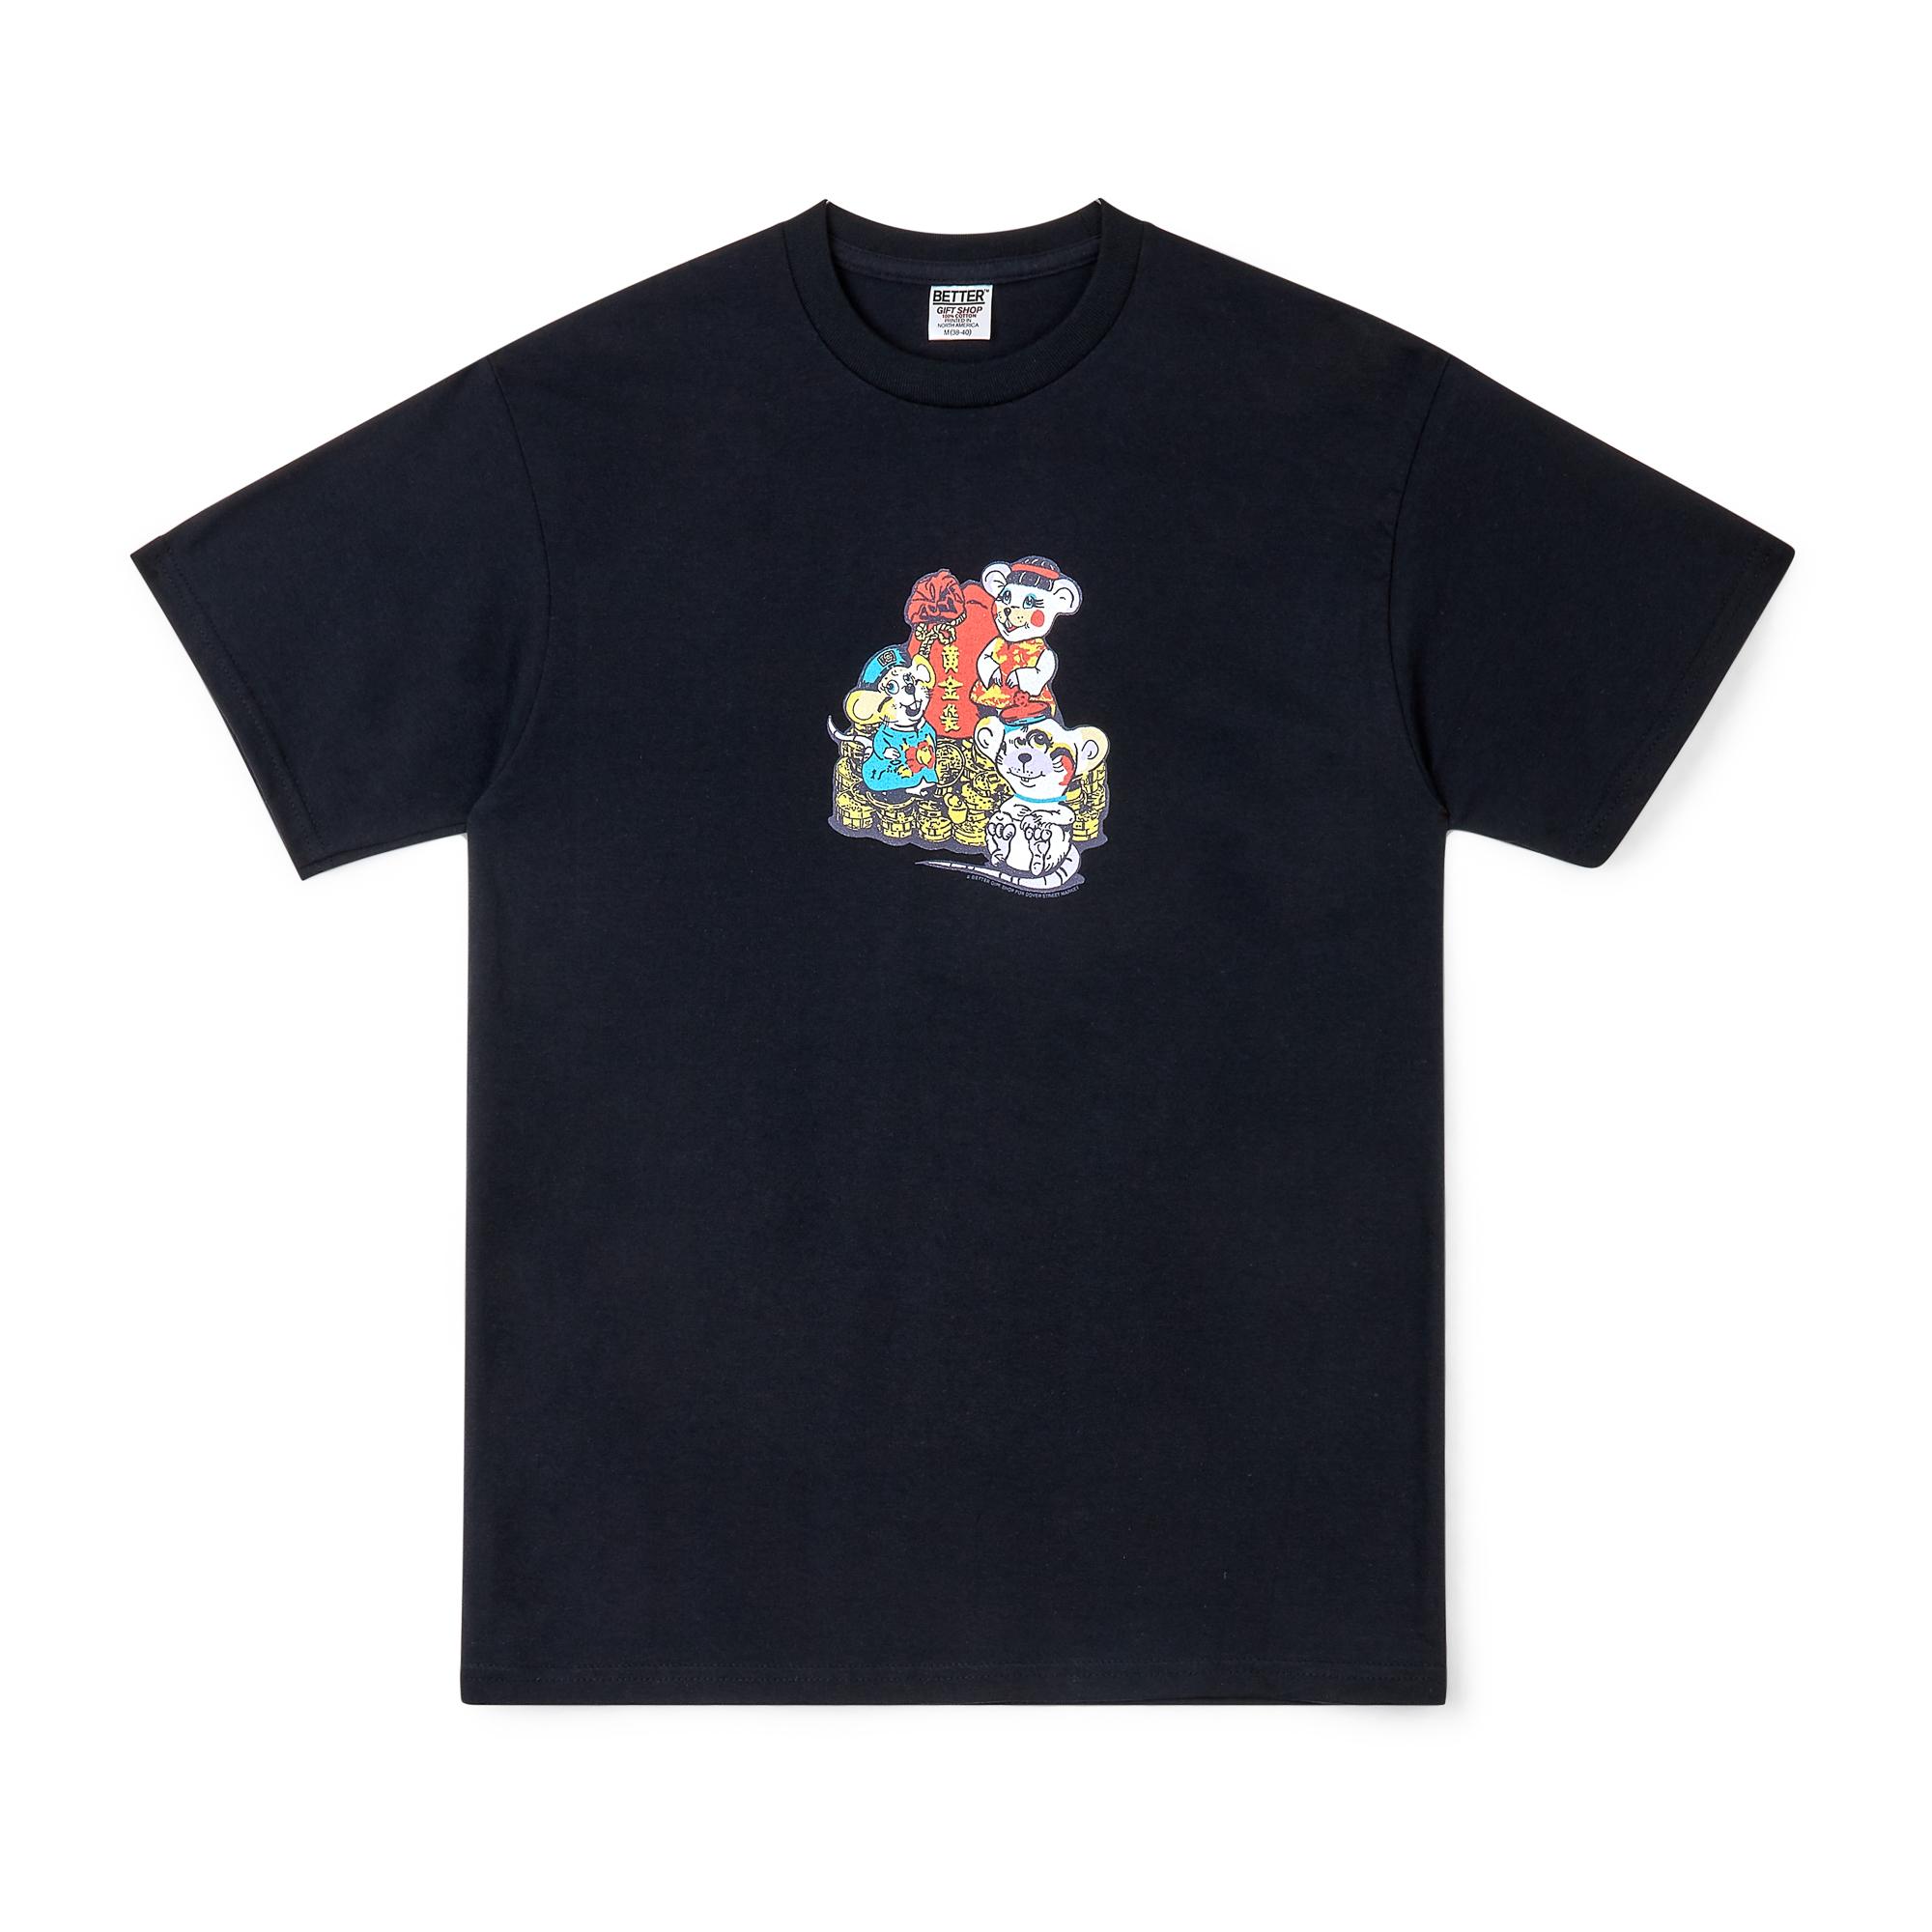 YOTR-T-shirts_Better_057.jpg